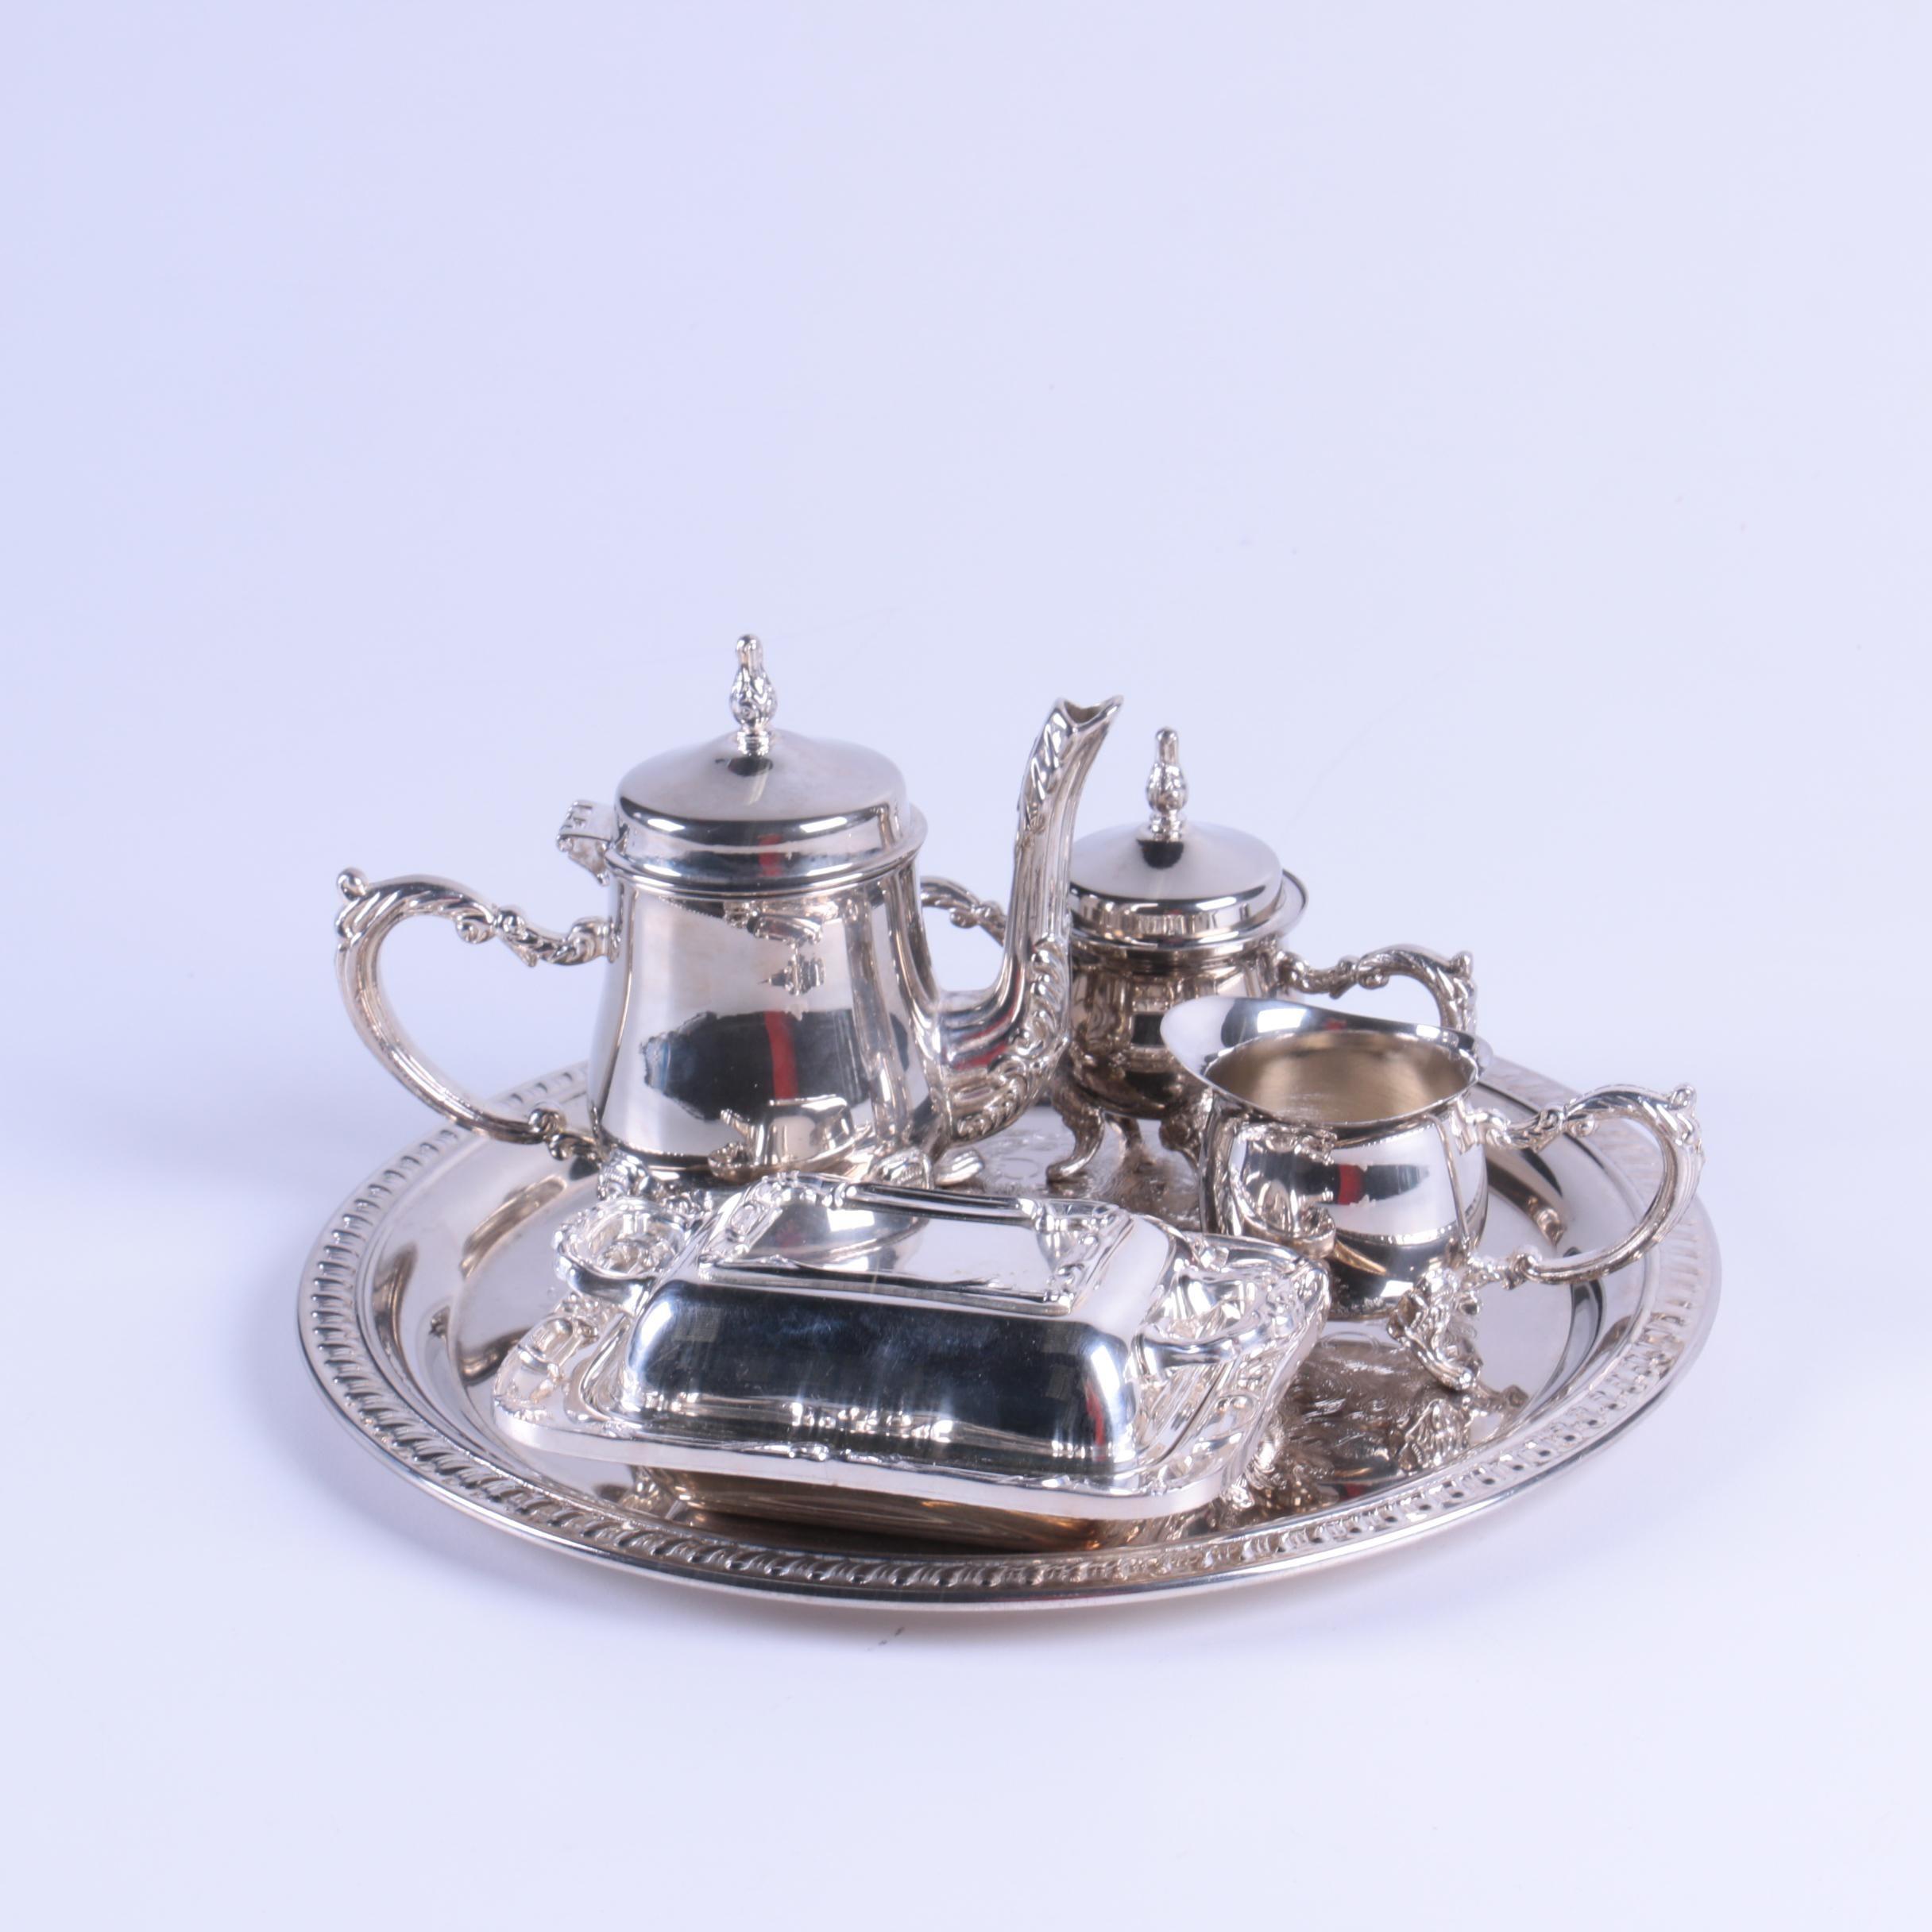 Godinger Silver Art Co. Silver Plate Tea Service